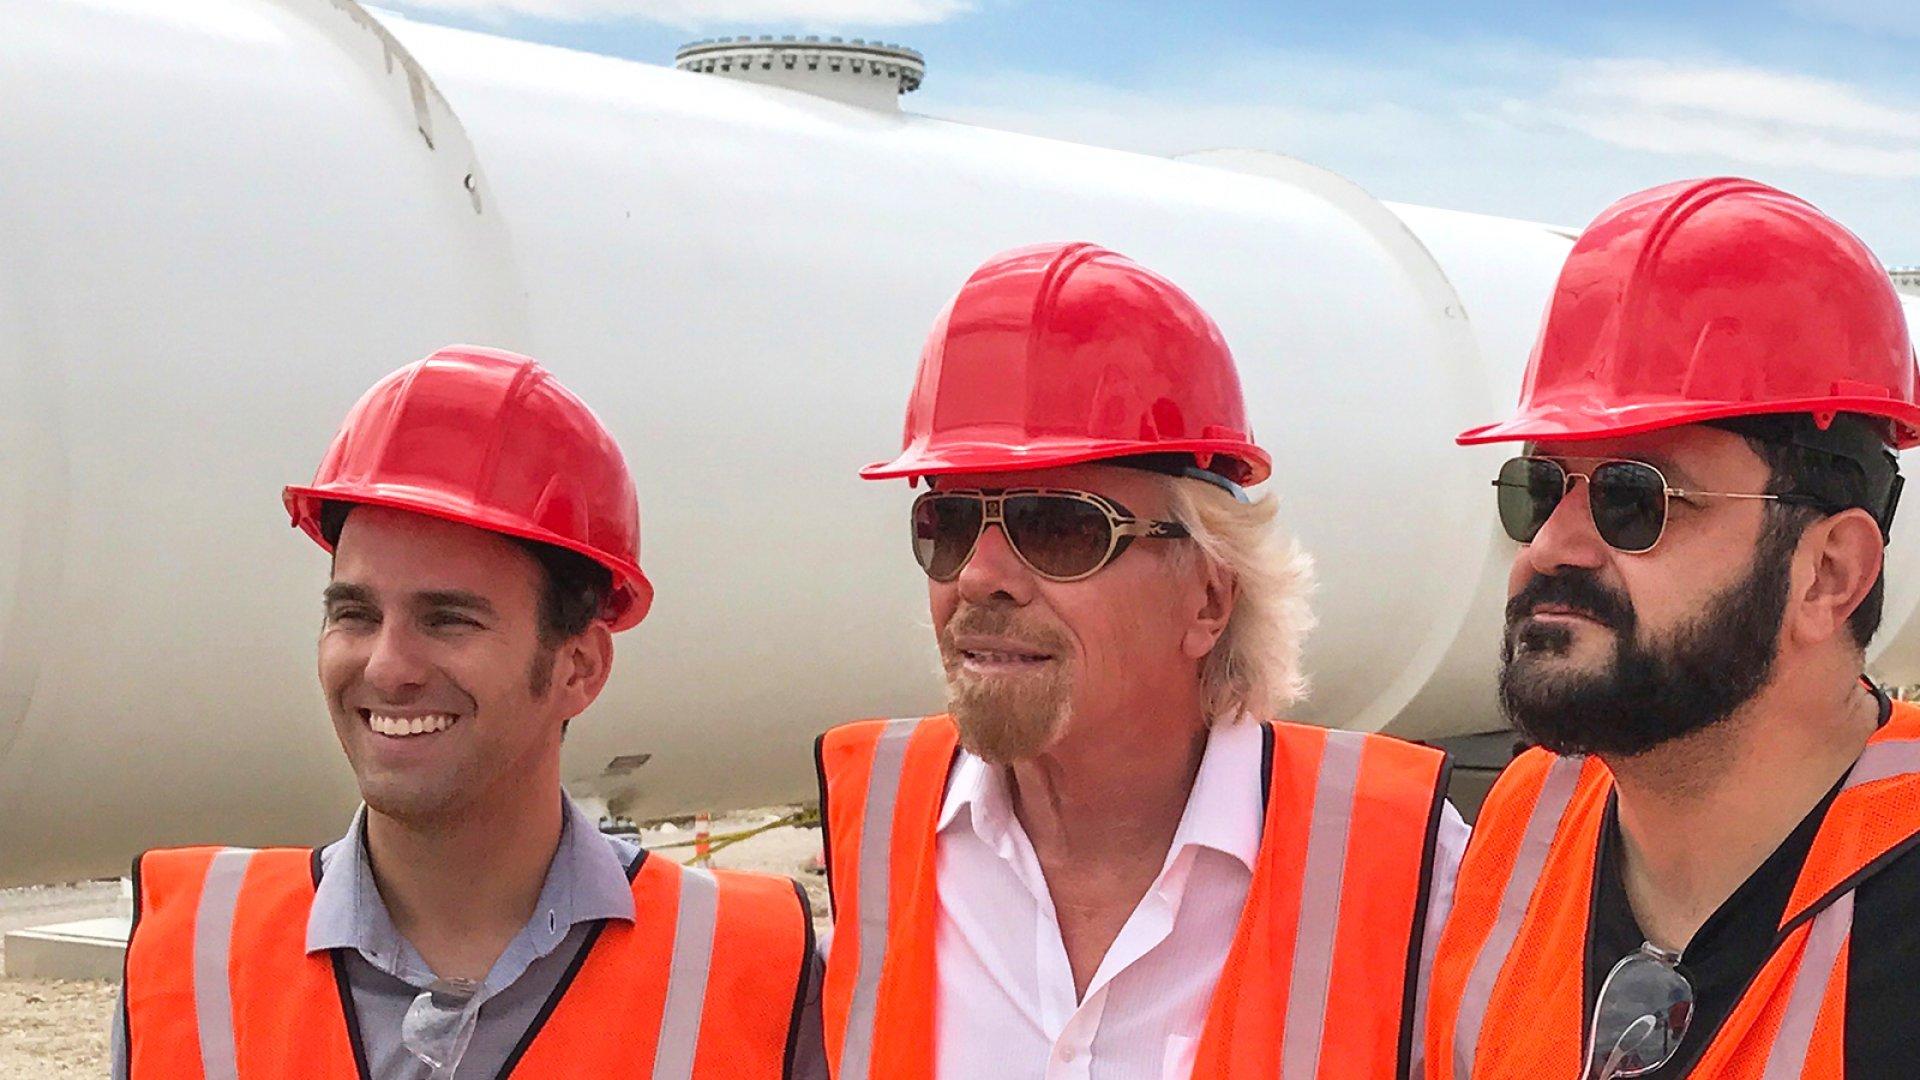 Richard Branson (center) with Hyperloop One's co-founders Shervin Pishevar (left) and Josh Giegel at Hyperloop One's Nevada test track.